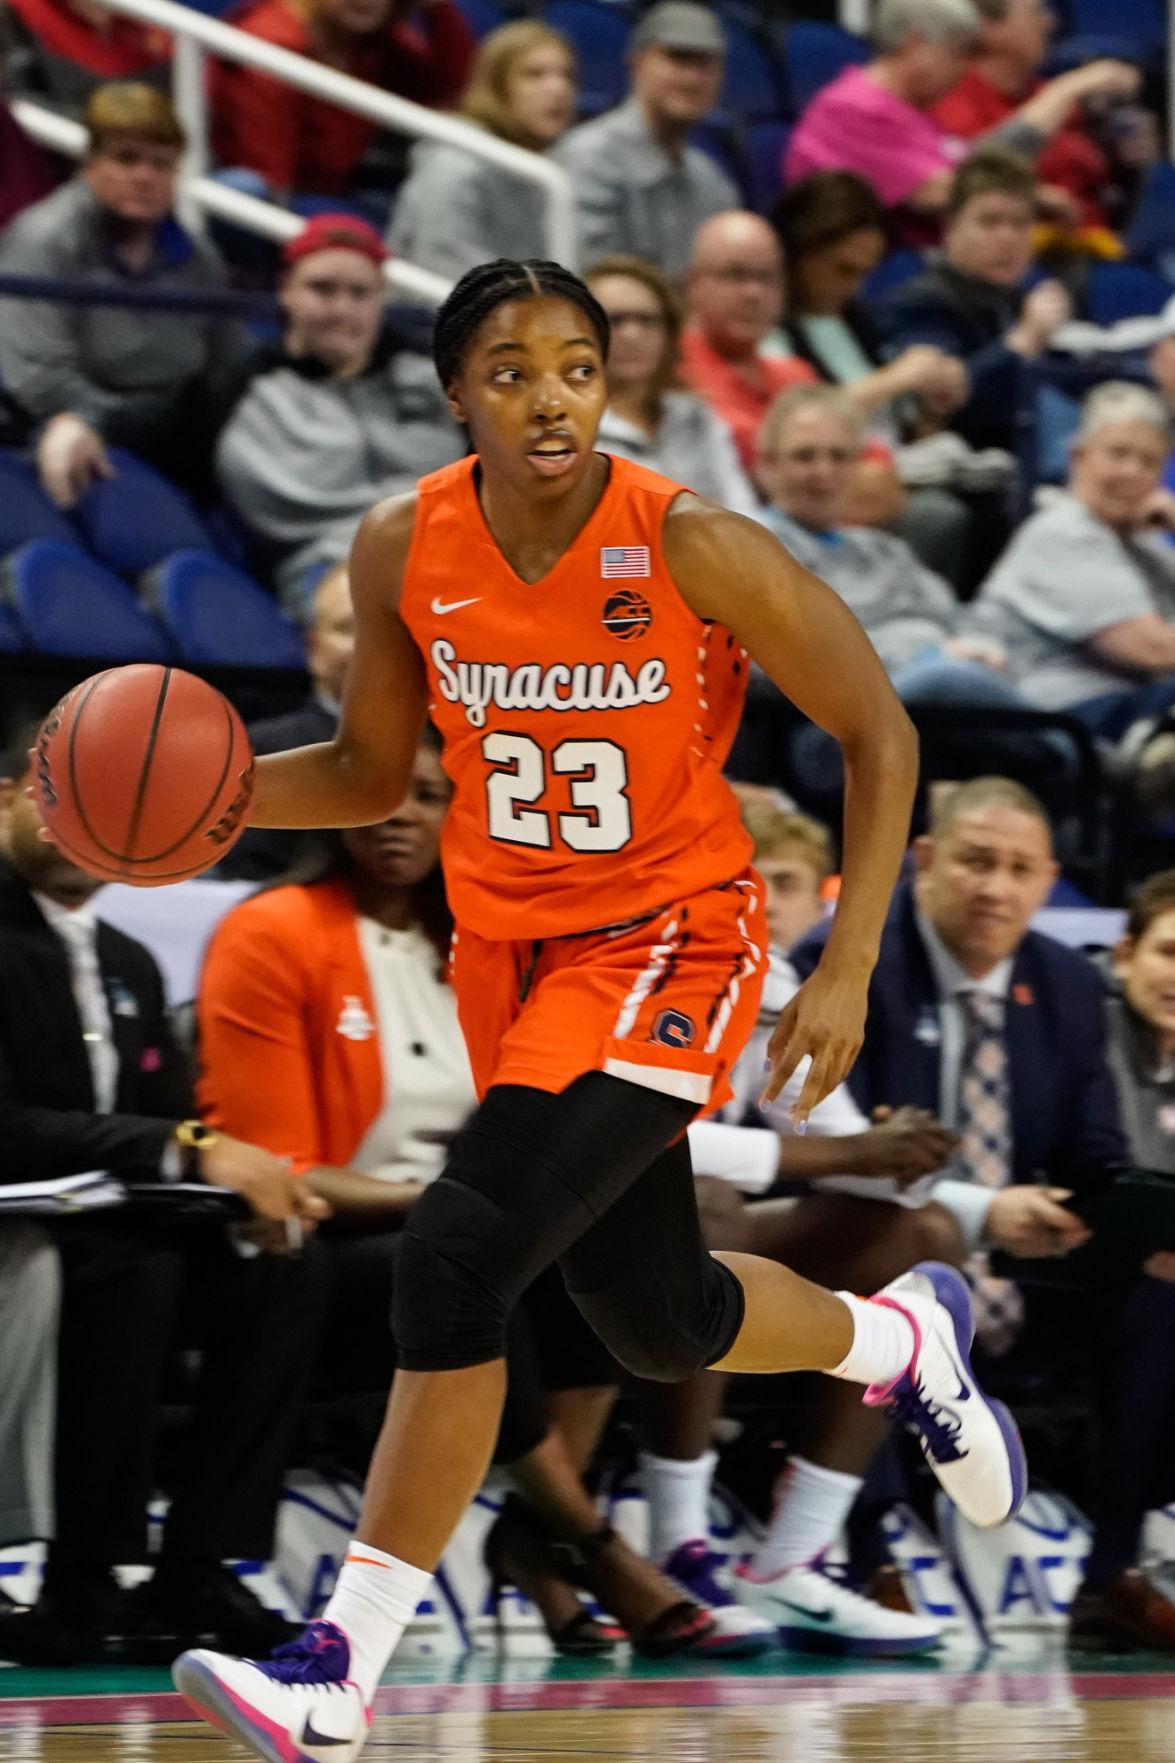 Syracuse's hopes through roof